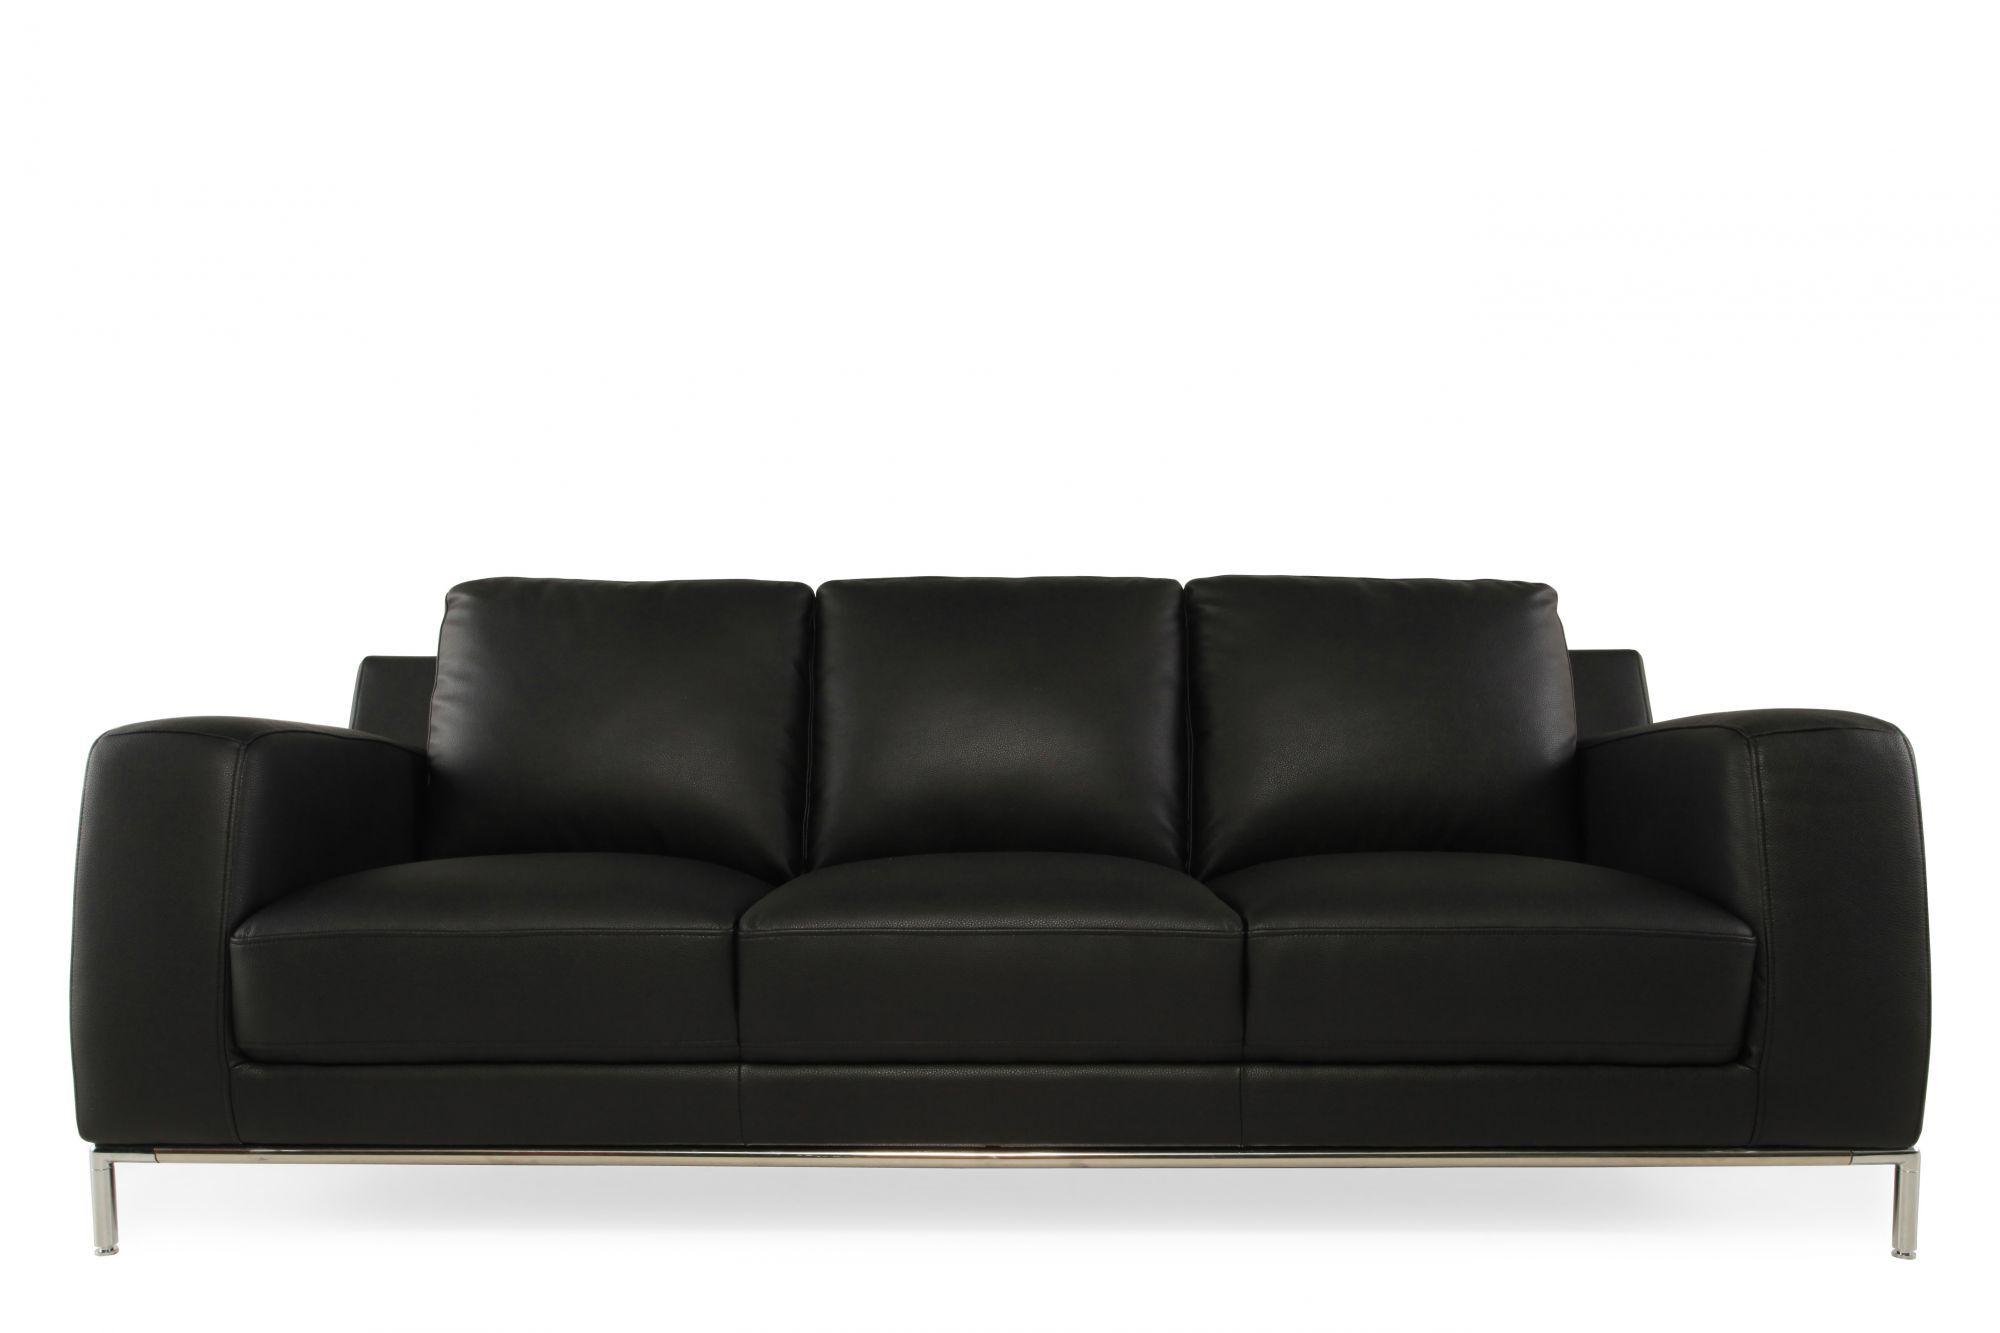 Images Low Profile Contemporary 85u0026quot; Sofa In Ebony Black Low Profile  Contemporary 85u0026quot; Sofa In Ebony Black